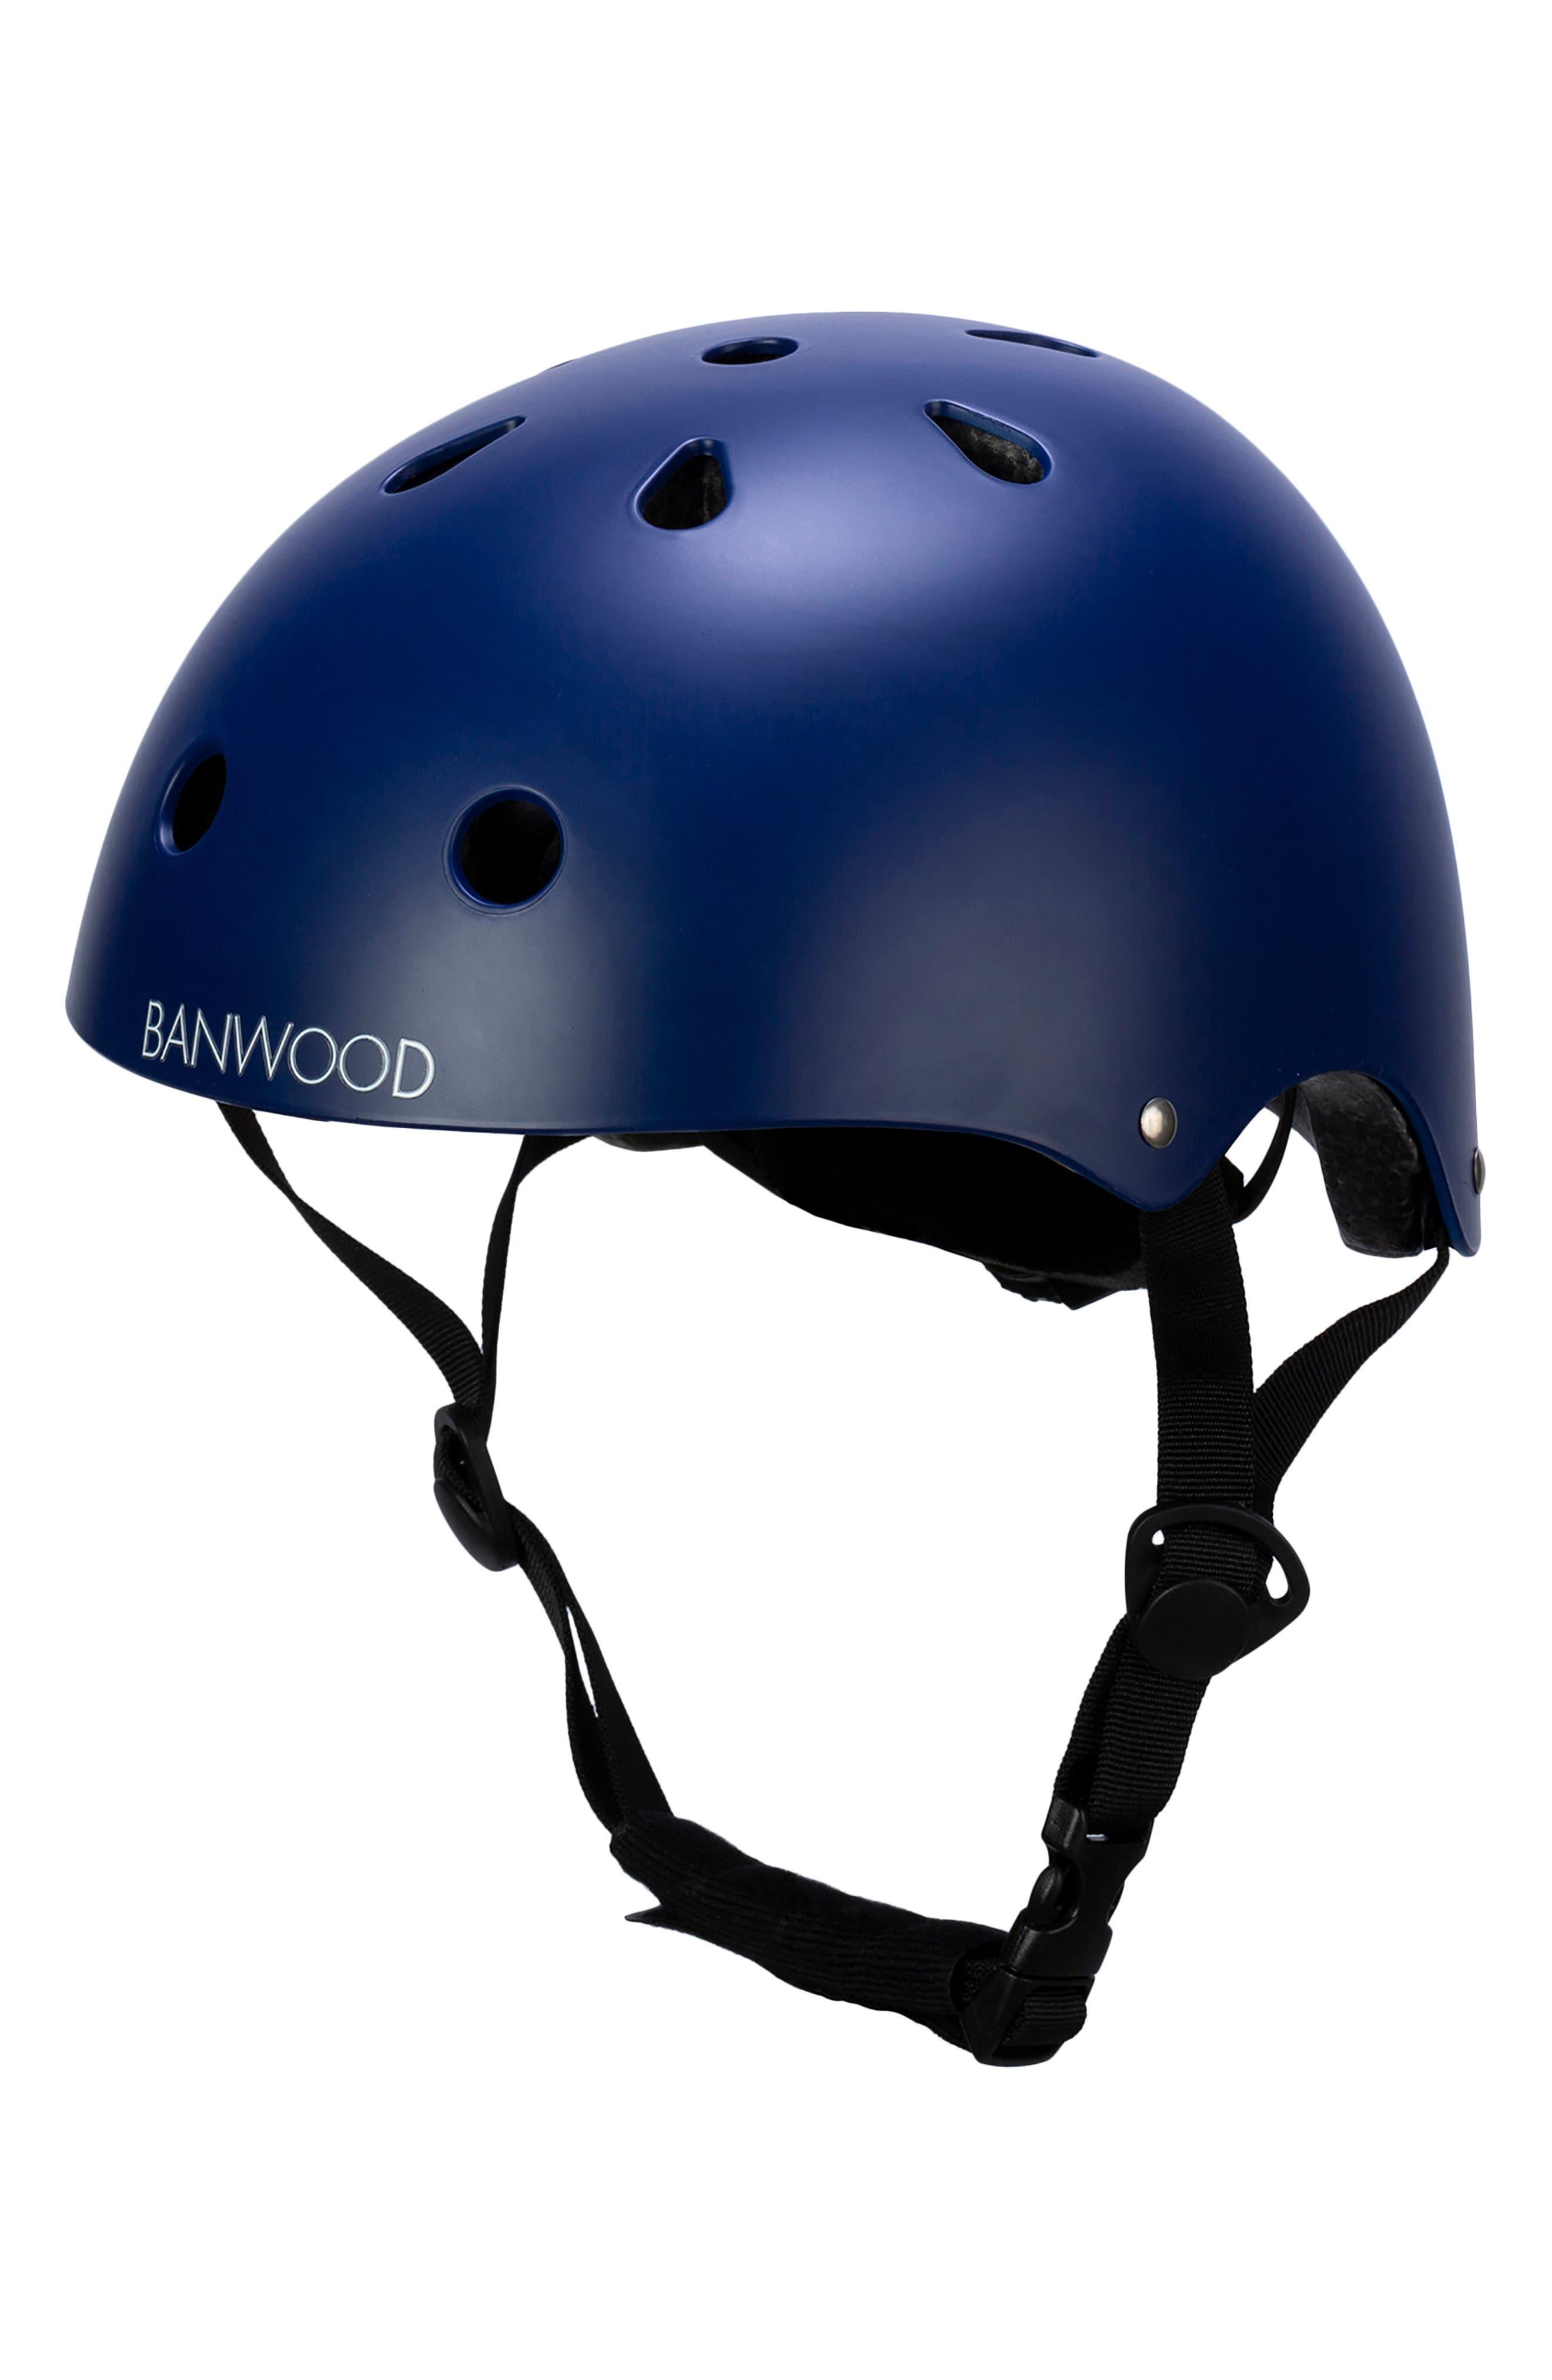 Banwood Bike Helmet - Blue